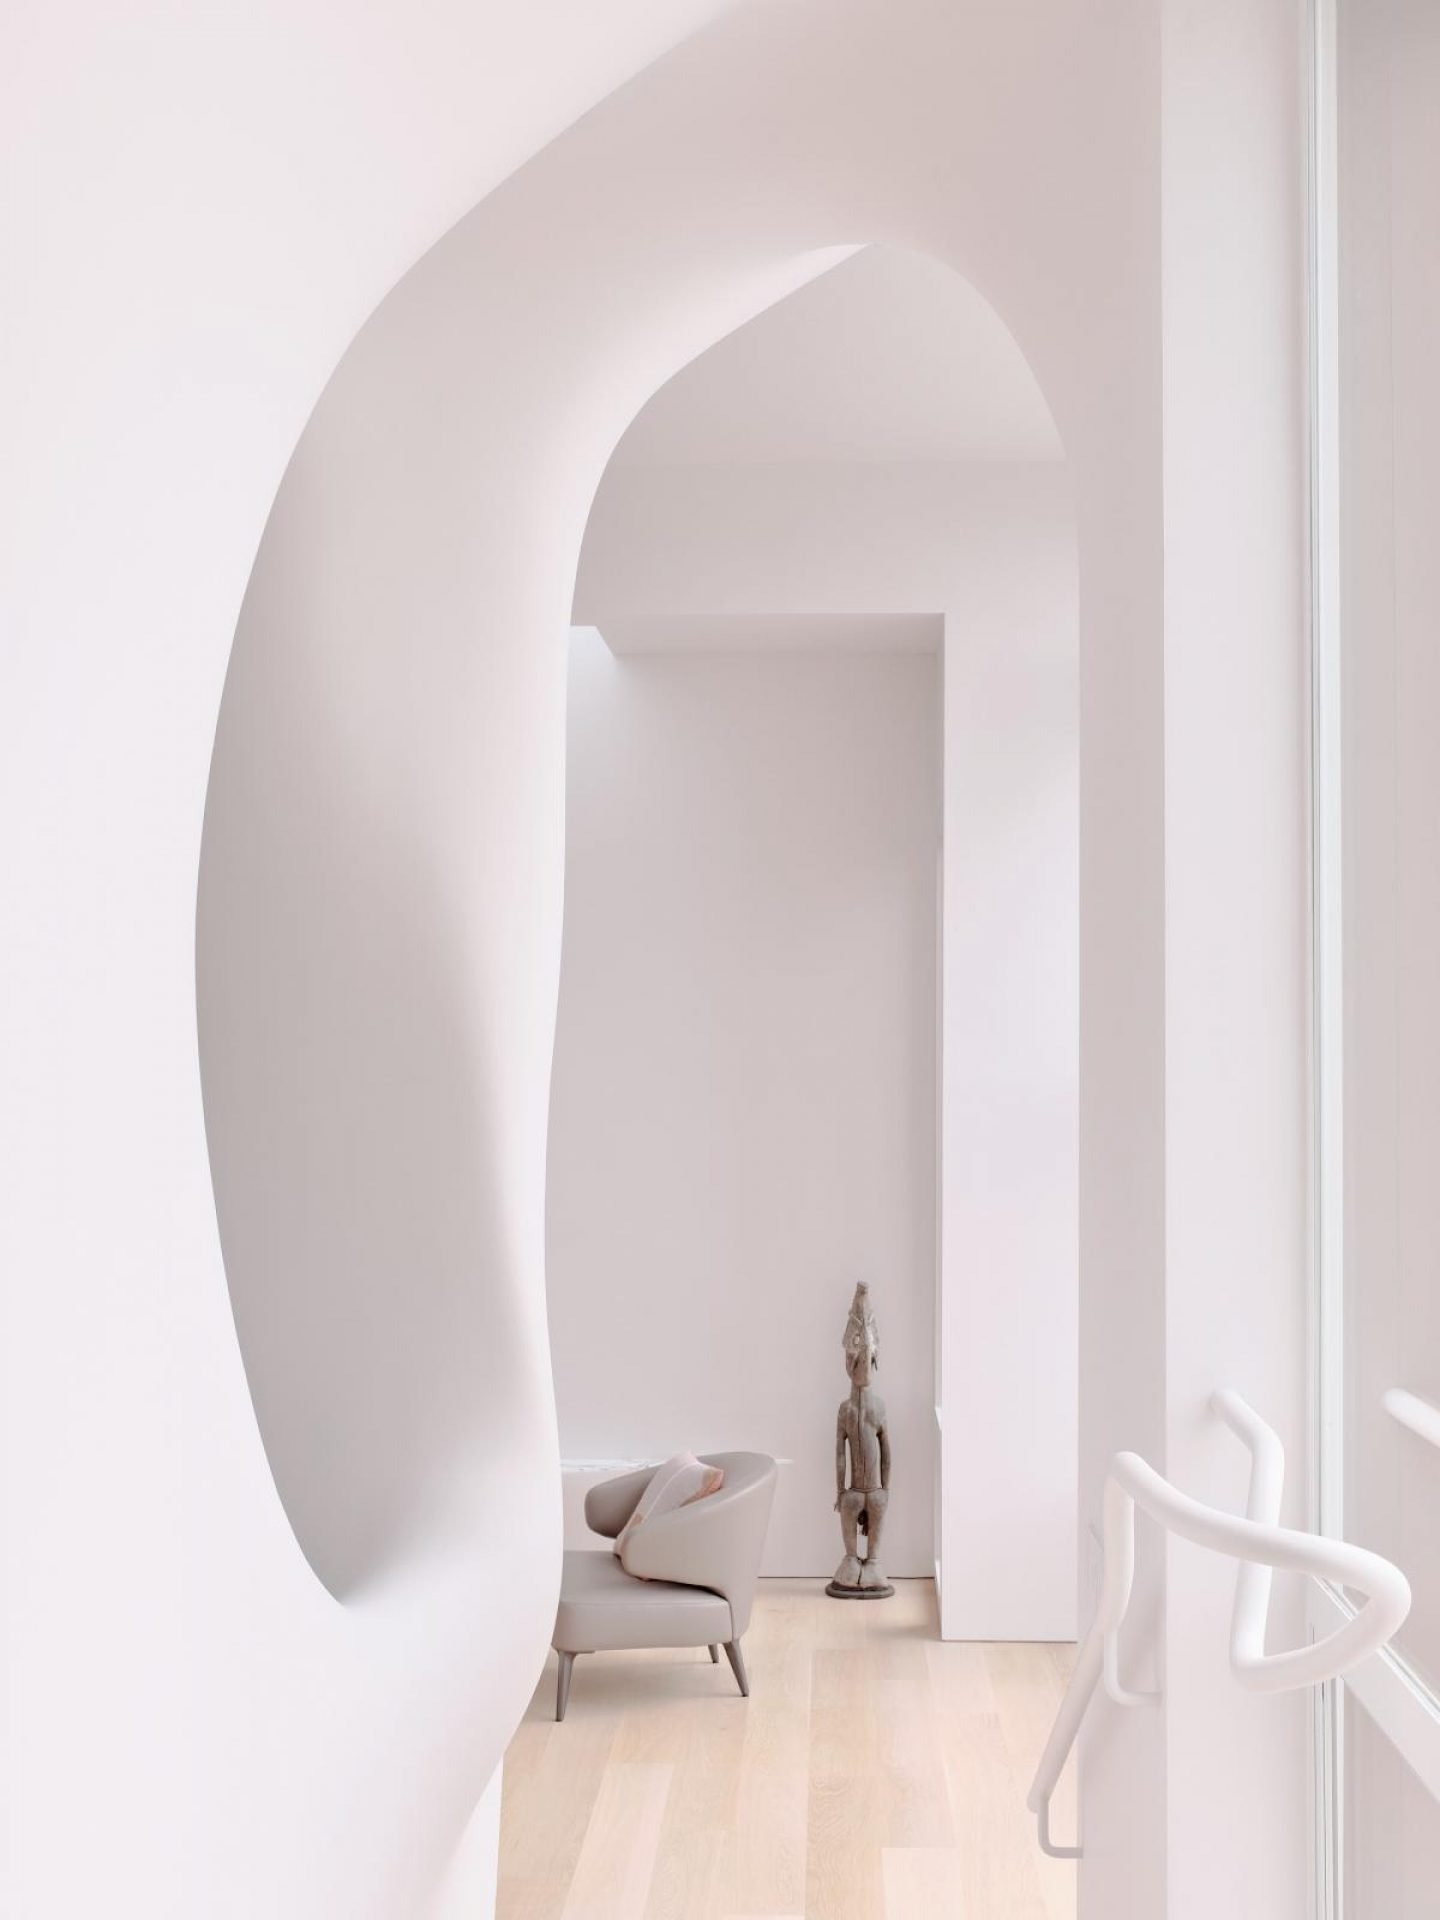 IGNANT-Architecture-Opa-Softie-02